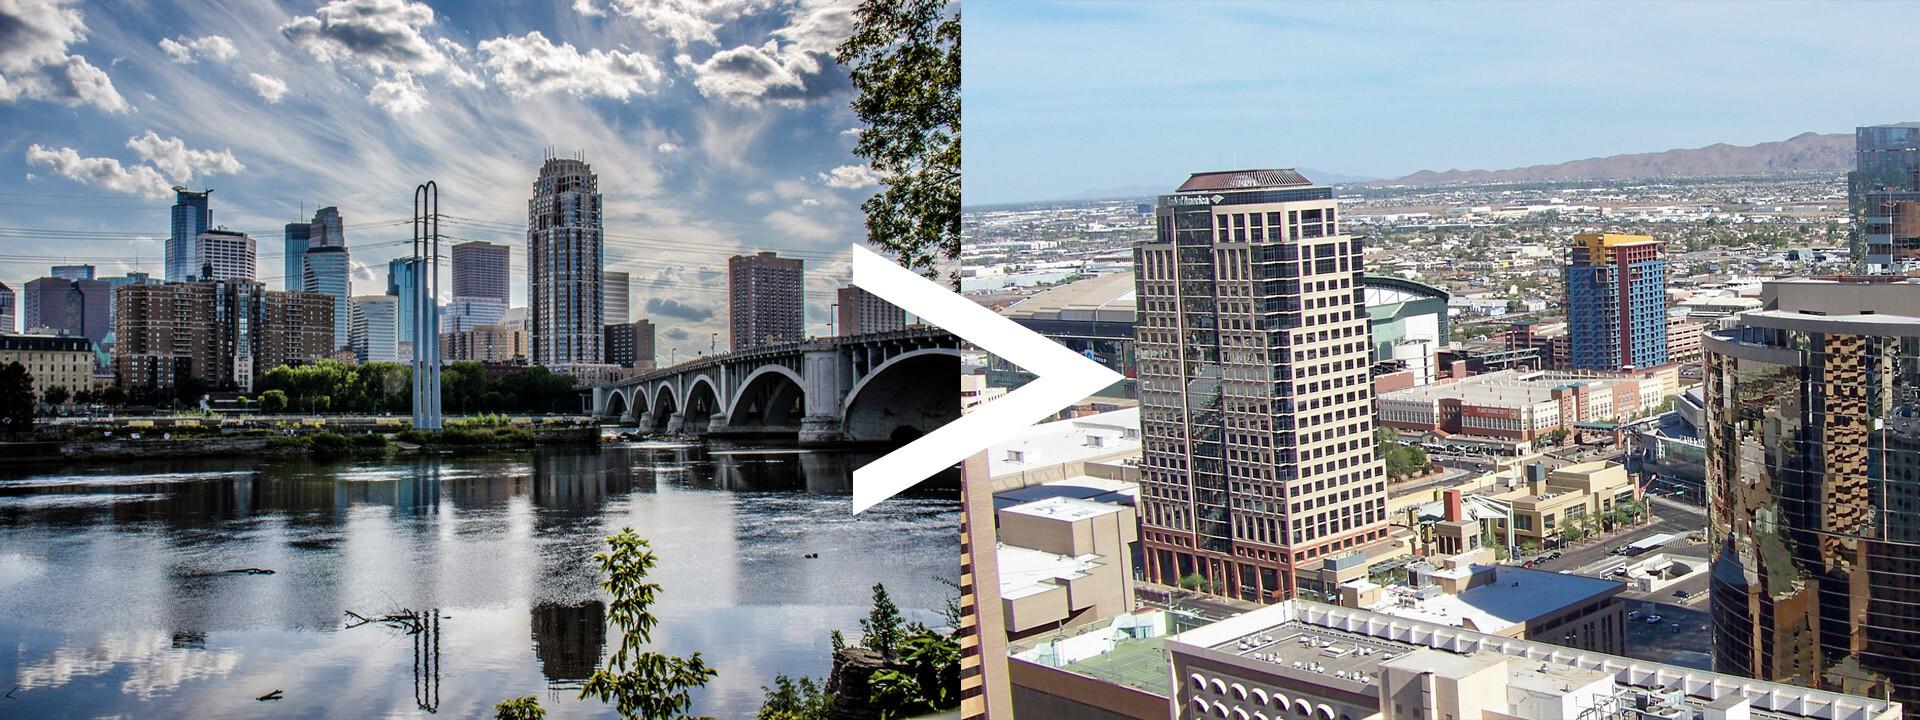 Auto Transport Route Minneapolis to Phoenix